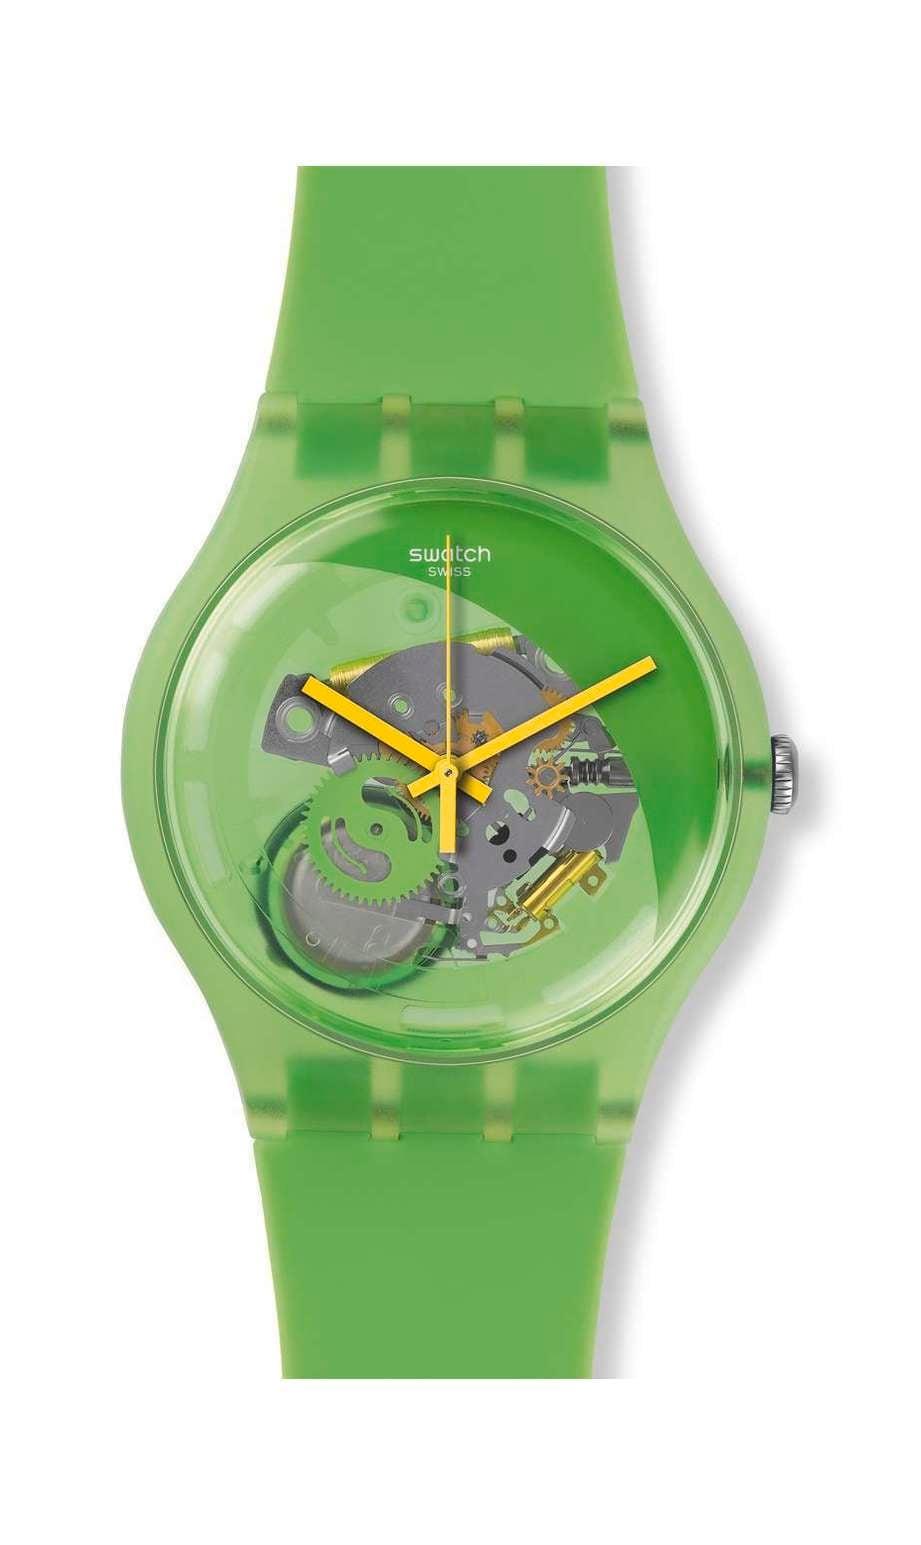 Swatch - POMME-TECH - 1